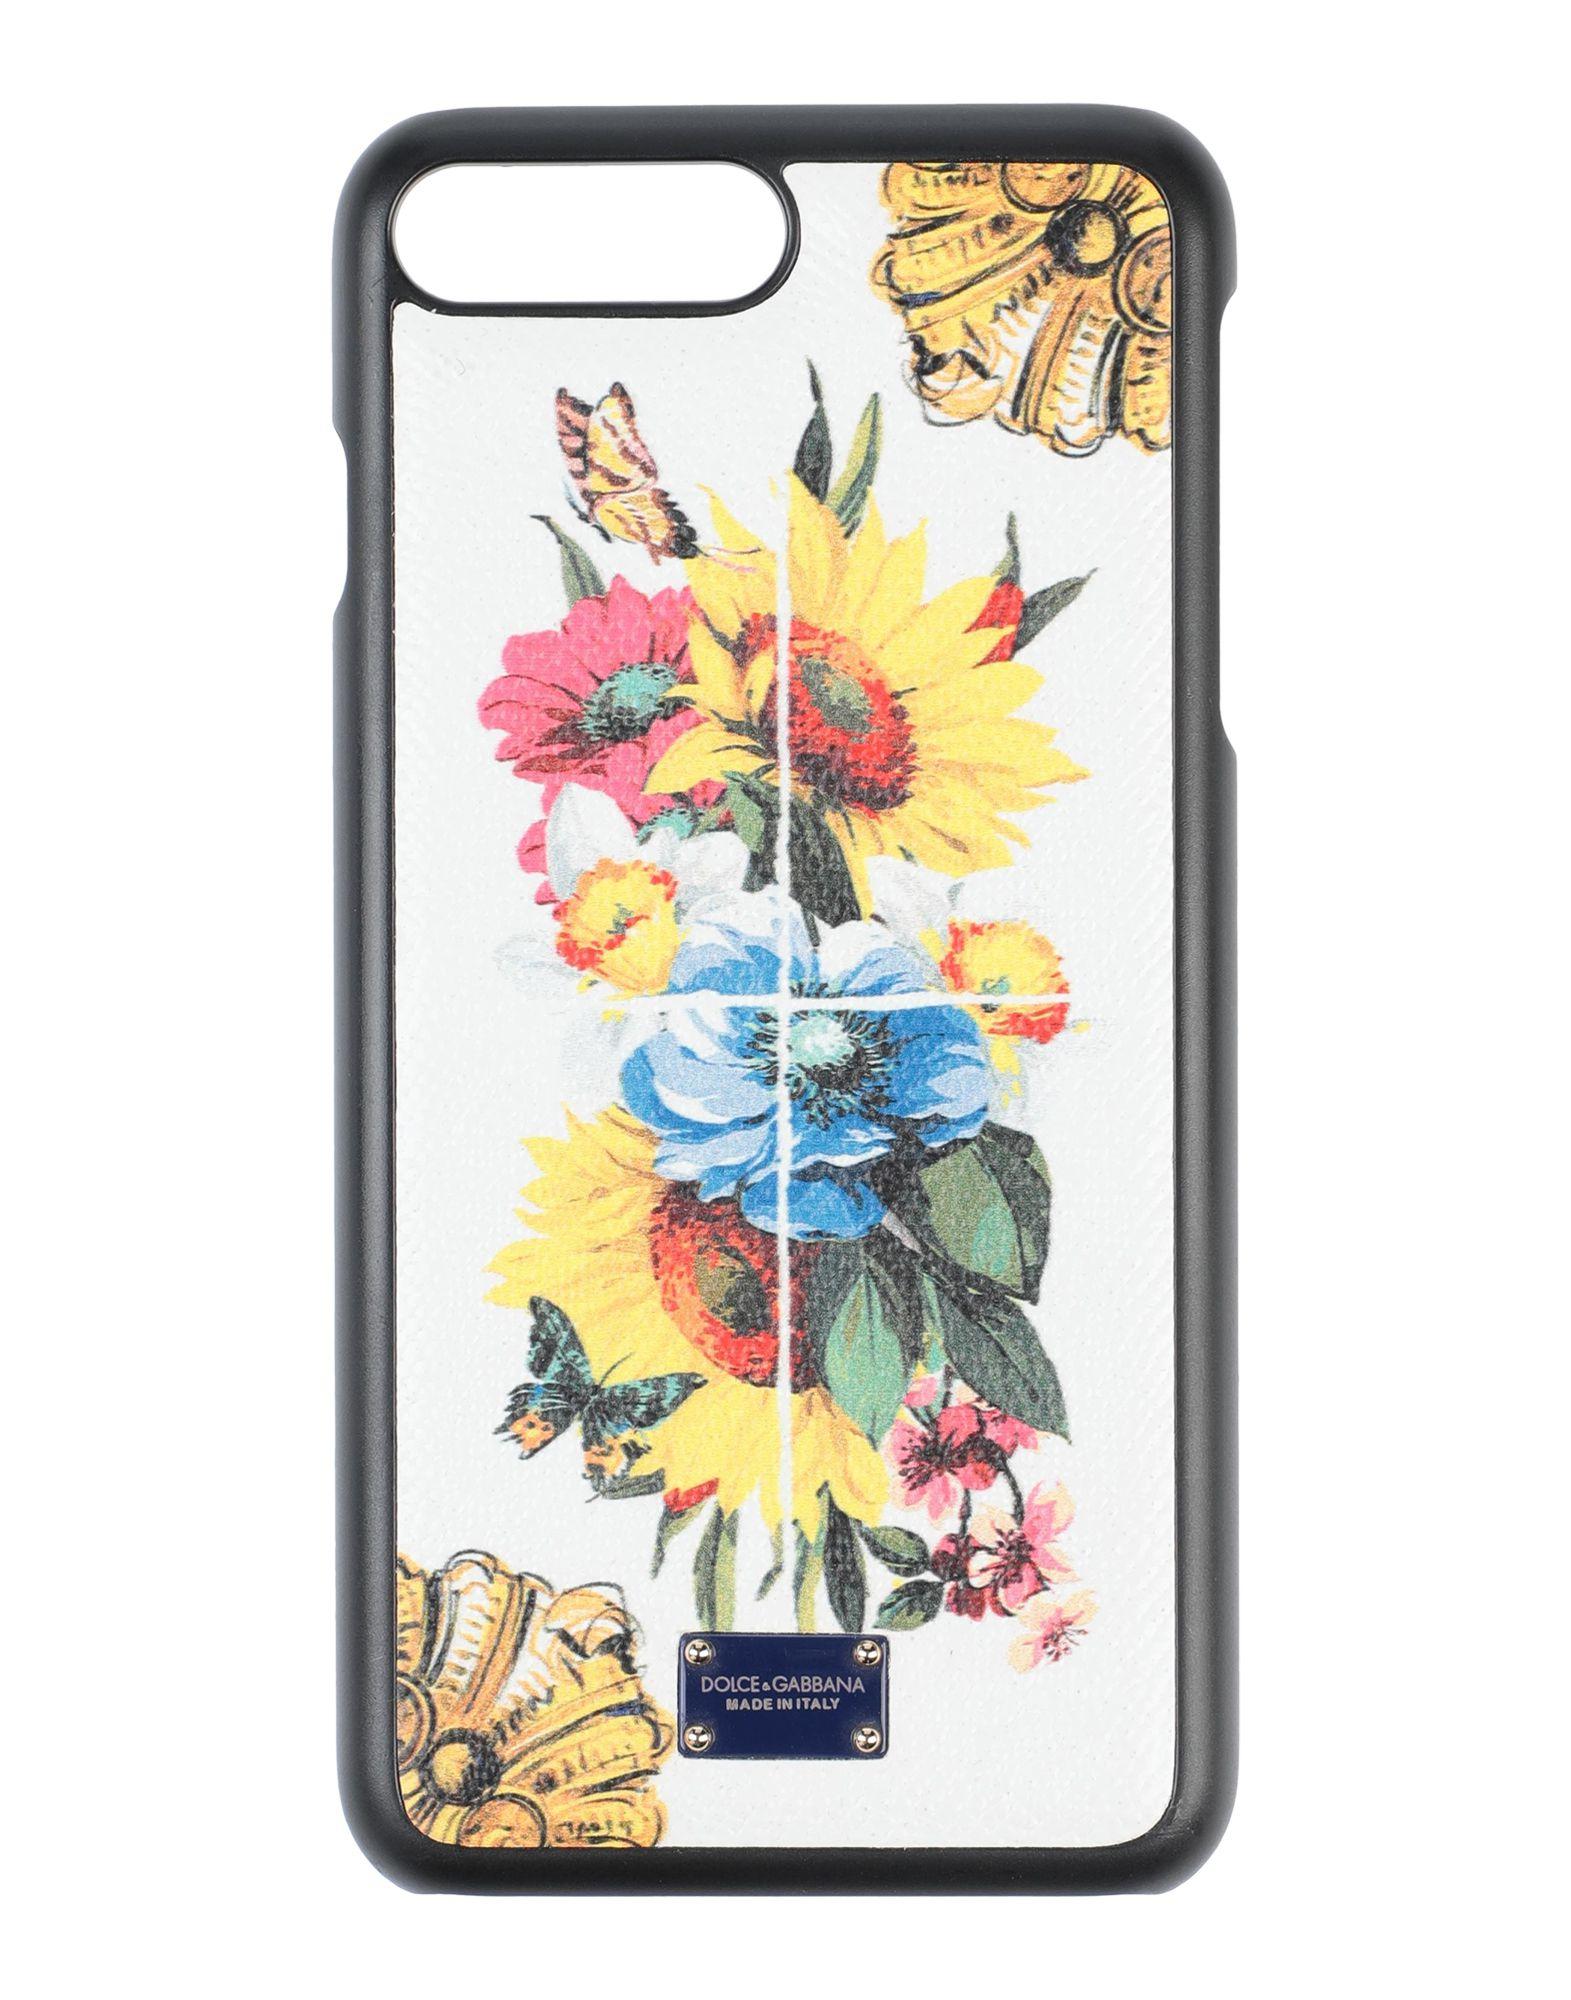 Фото - DOLCE & GABBANA Чехол кейс для назначение apple iphone 8 iphone 8 plus кейс для iphone 5 iphone 6 iphone 6 plus iphone 7 plus iphone 7 со стендом с окошком флип